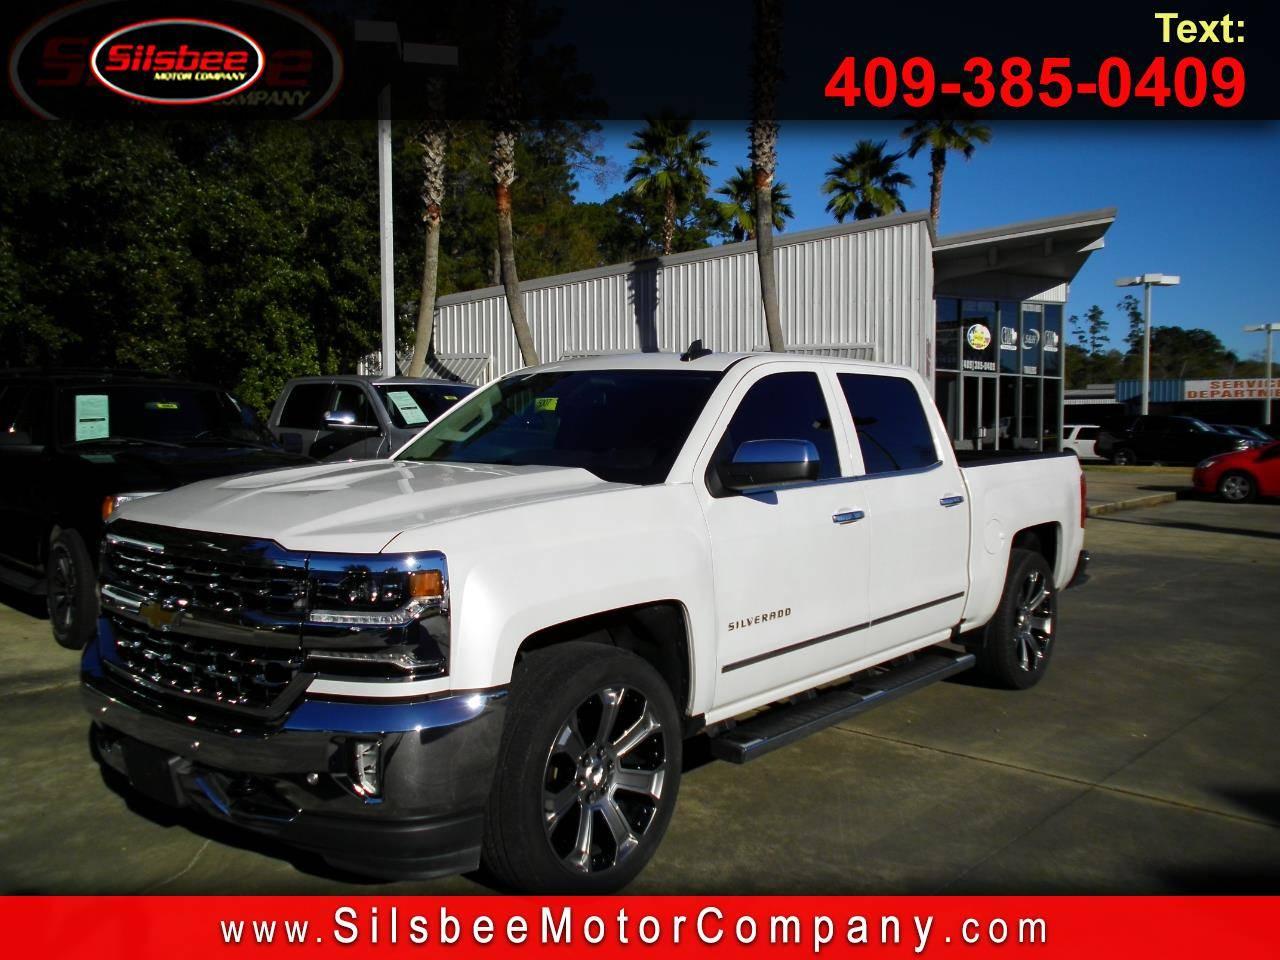 "2017 Chevrolet Silverado 1500 2WD Crew Cab 143.5"" LTZ w/1LZ Truck"